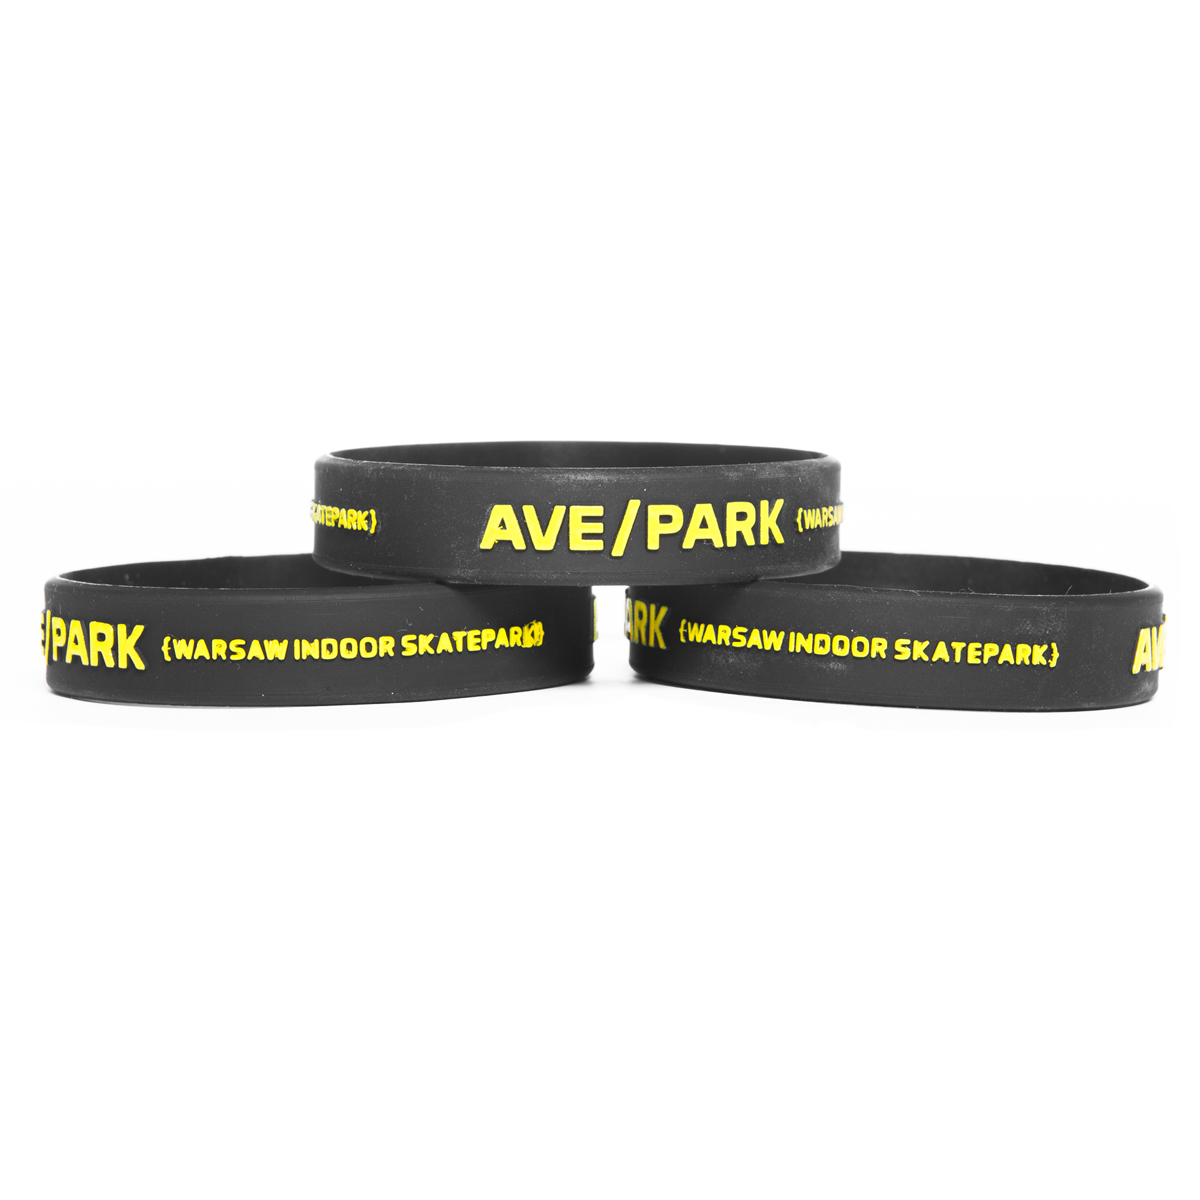 Opaska Ave/PARK Black